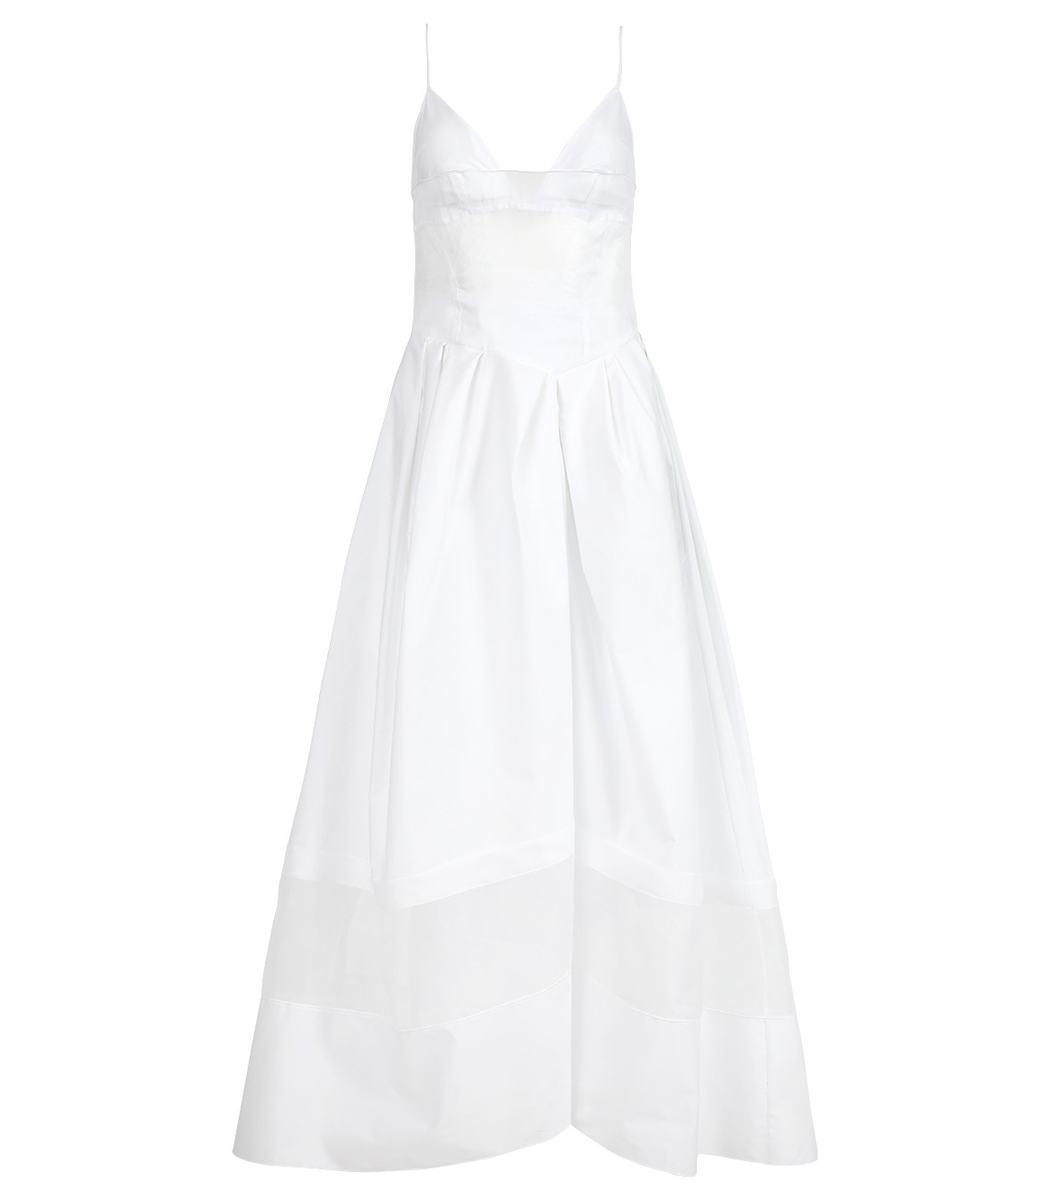 ROSIE ASSOULIN Dresses Layered Cami Dress, White